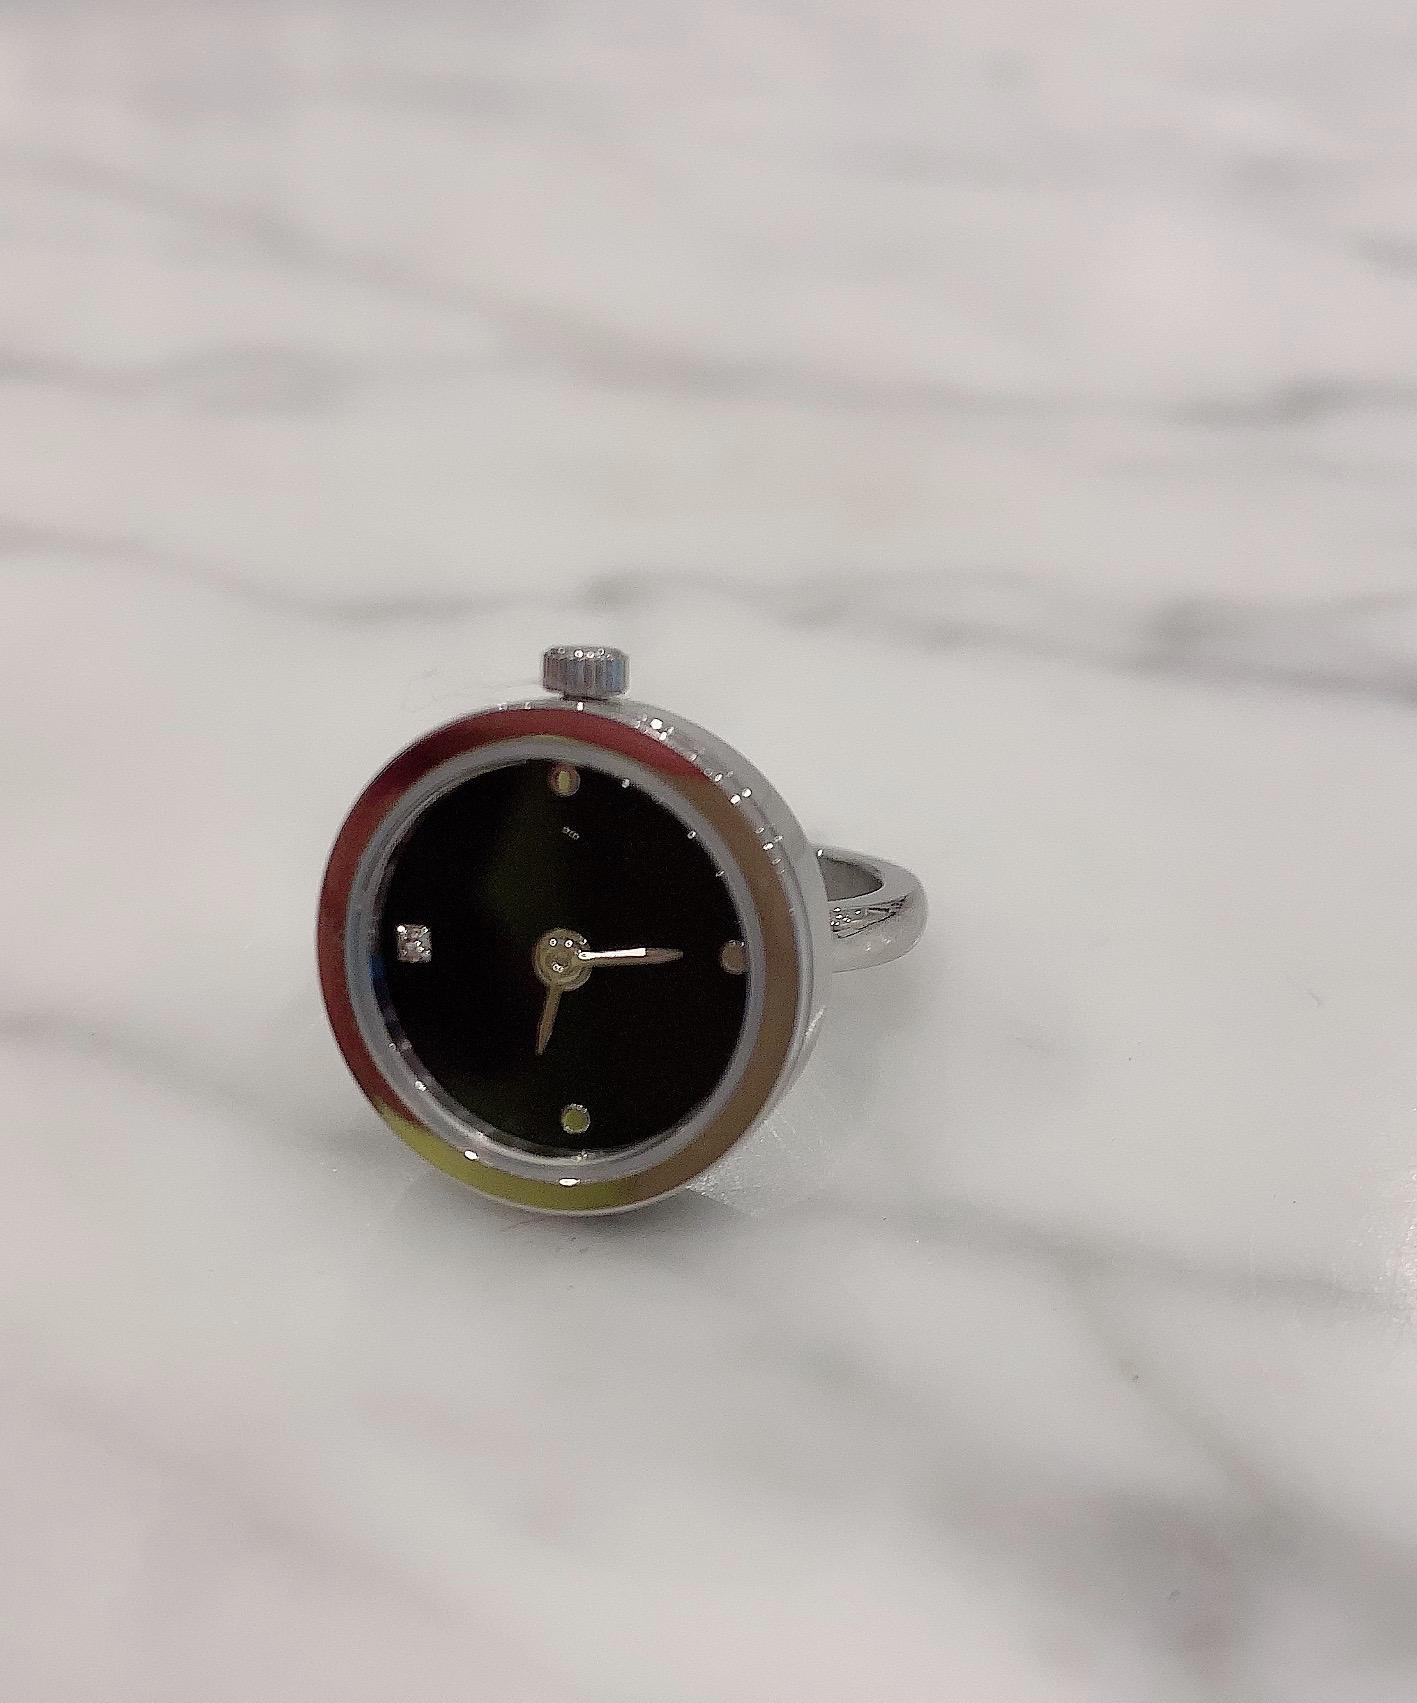 【selva secreta】Watch ring